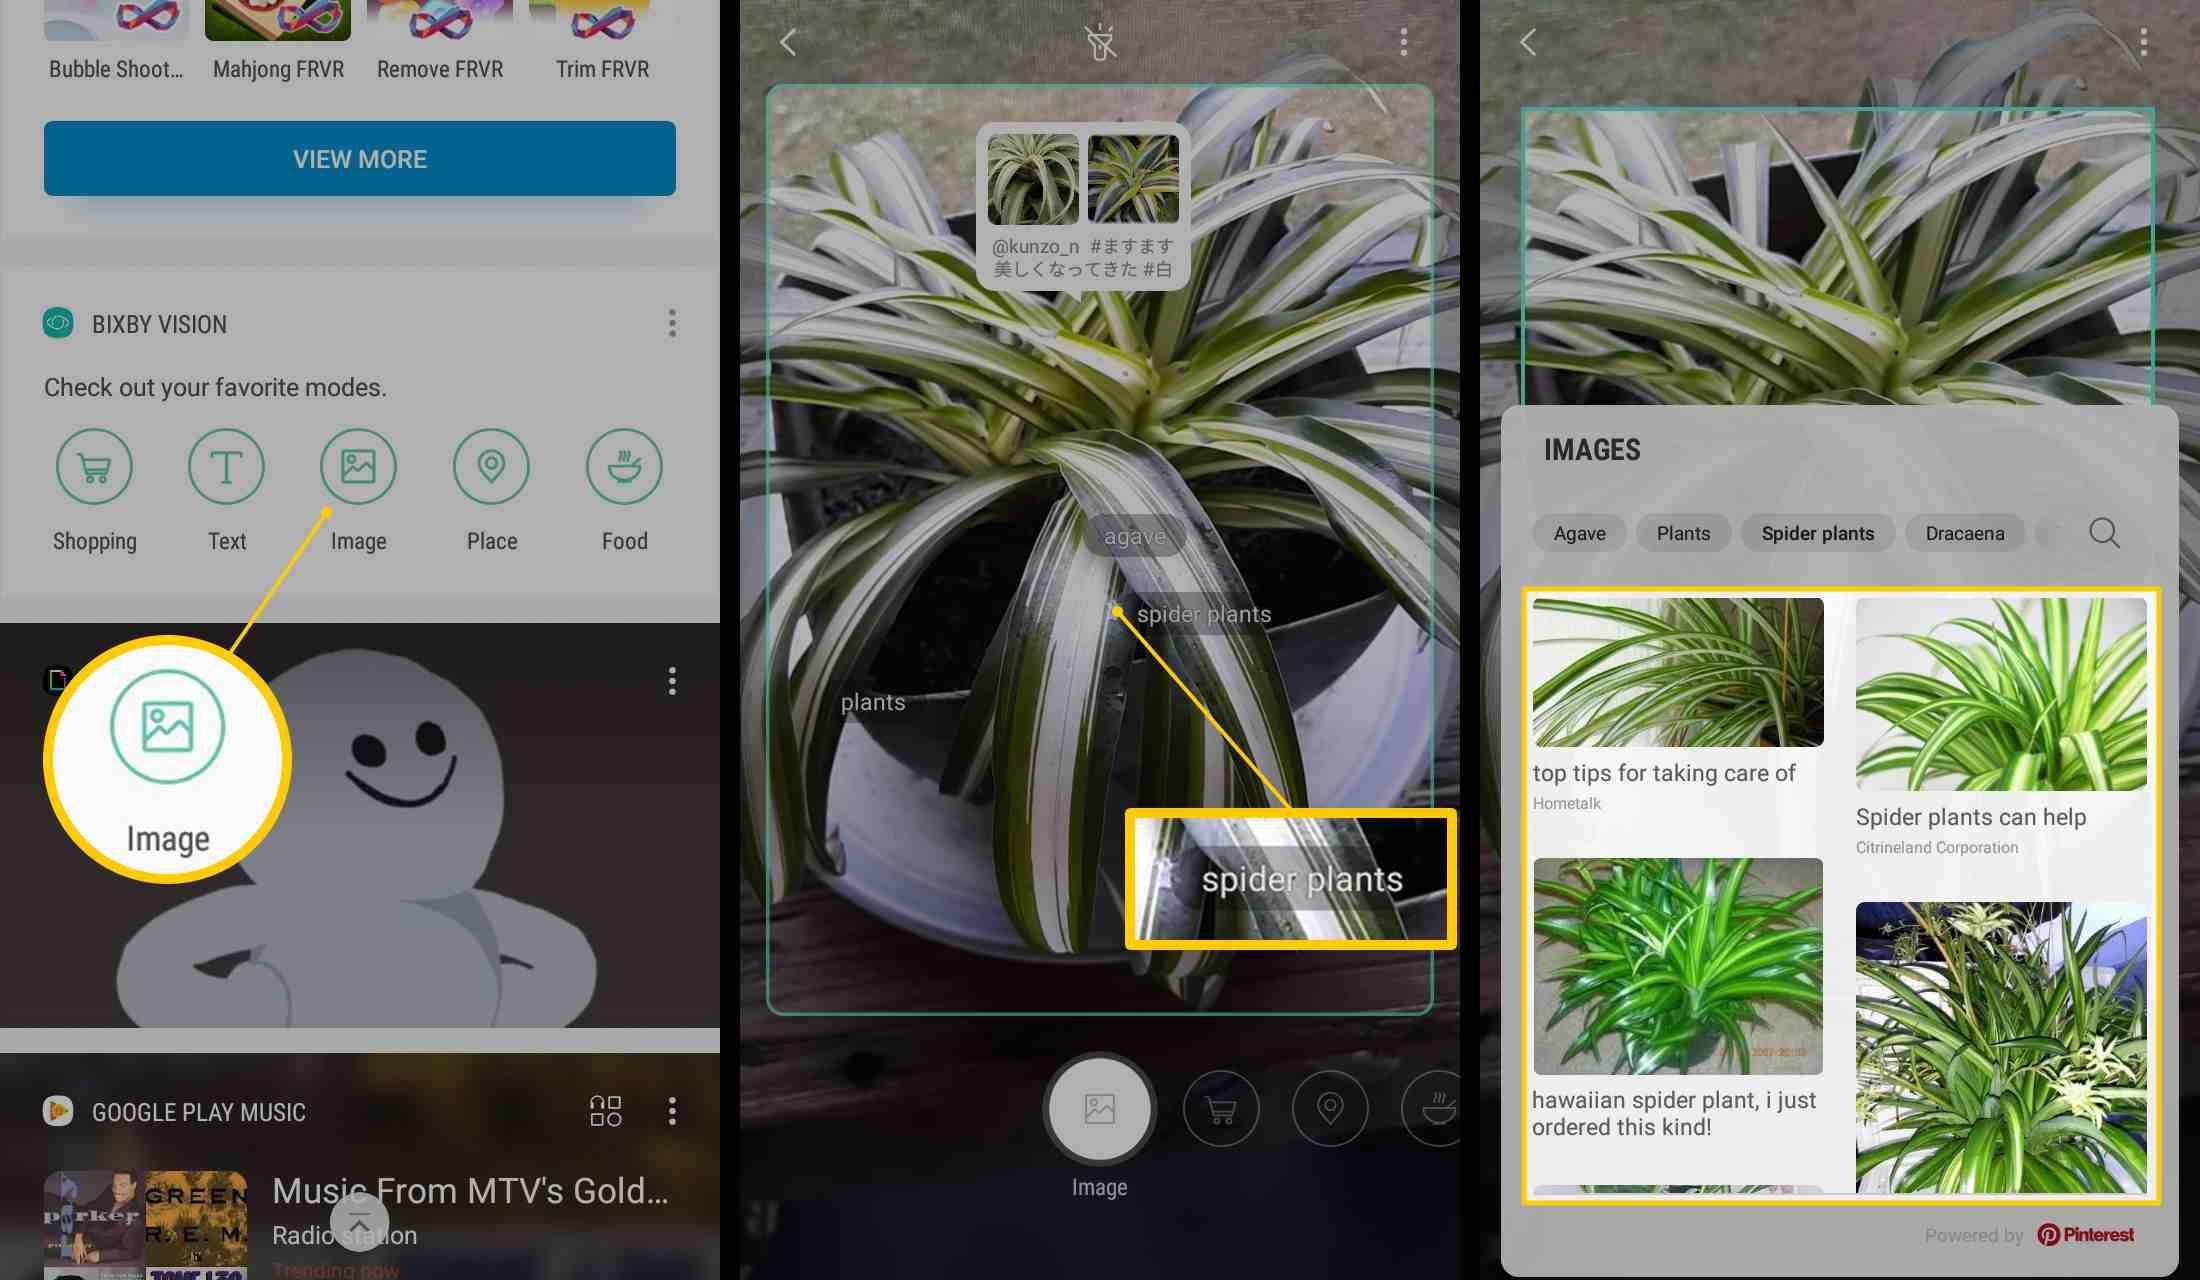 Samsung Bixby: 5 Ways Bixby Rocks